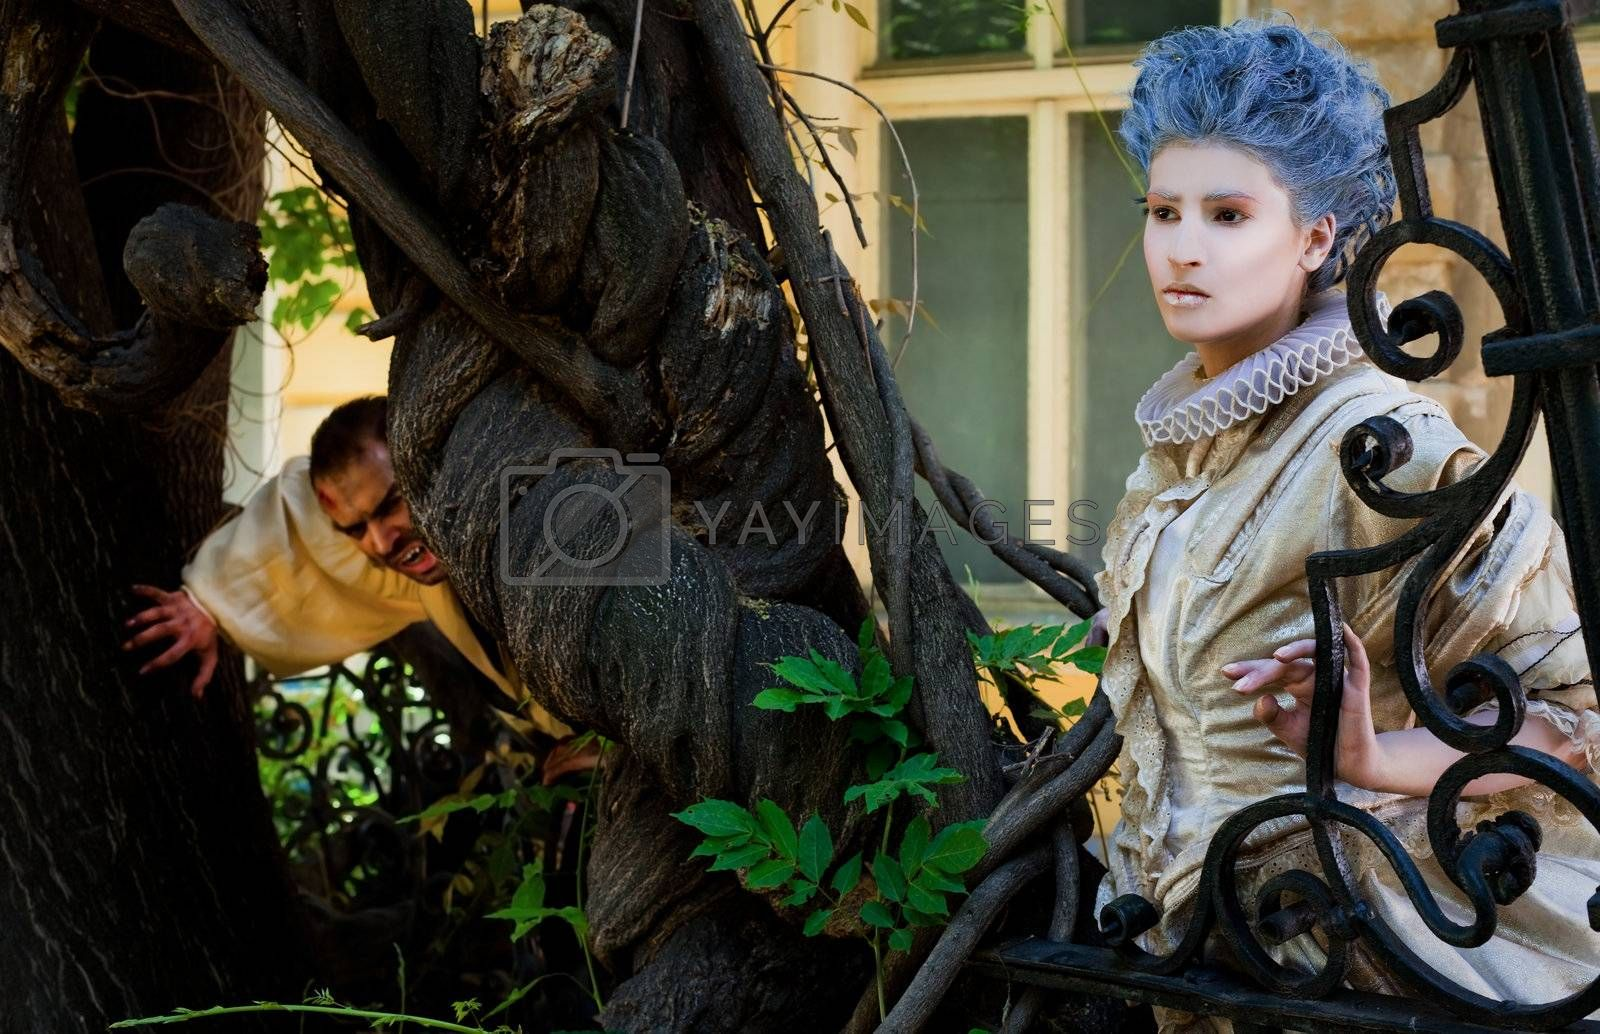 Male vampire stalking woman dressed in medieval costume